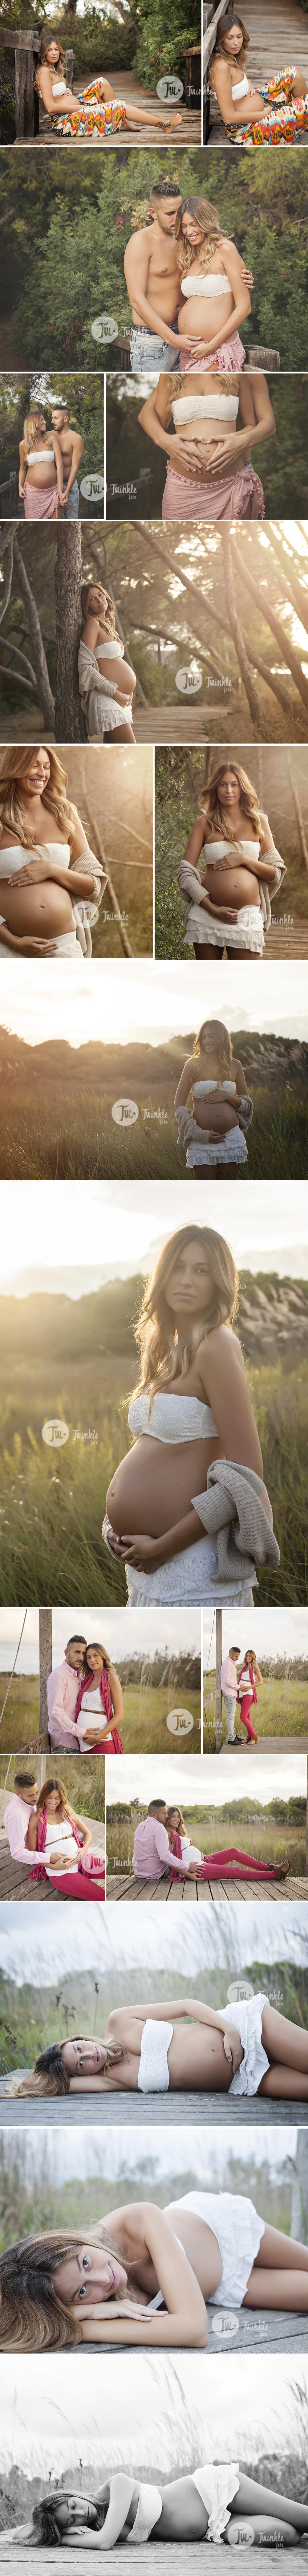 fotofgrafias de embarazada en exteriores_ ivana